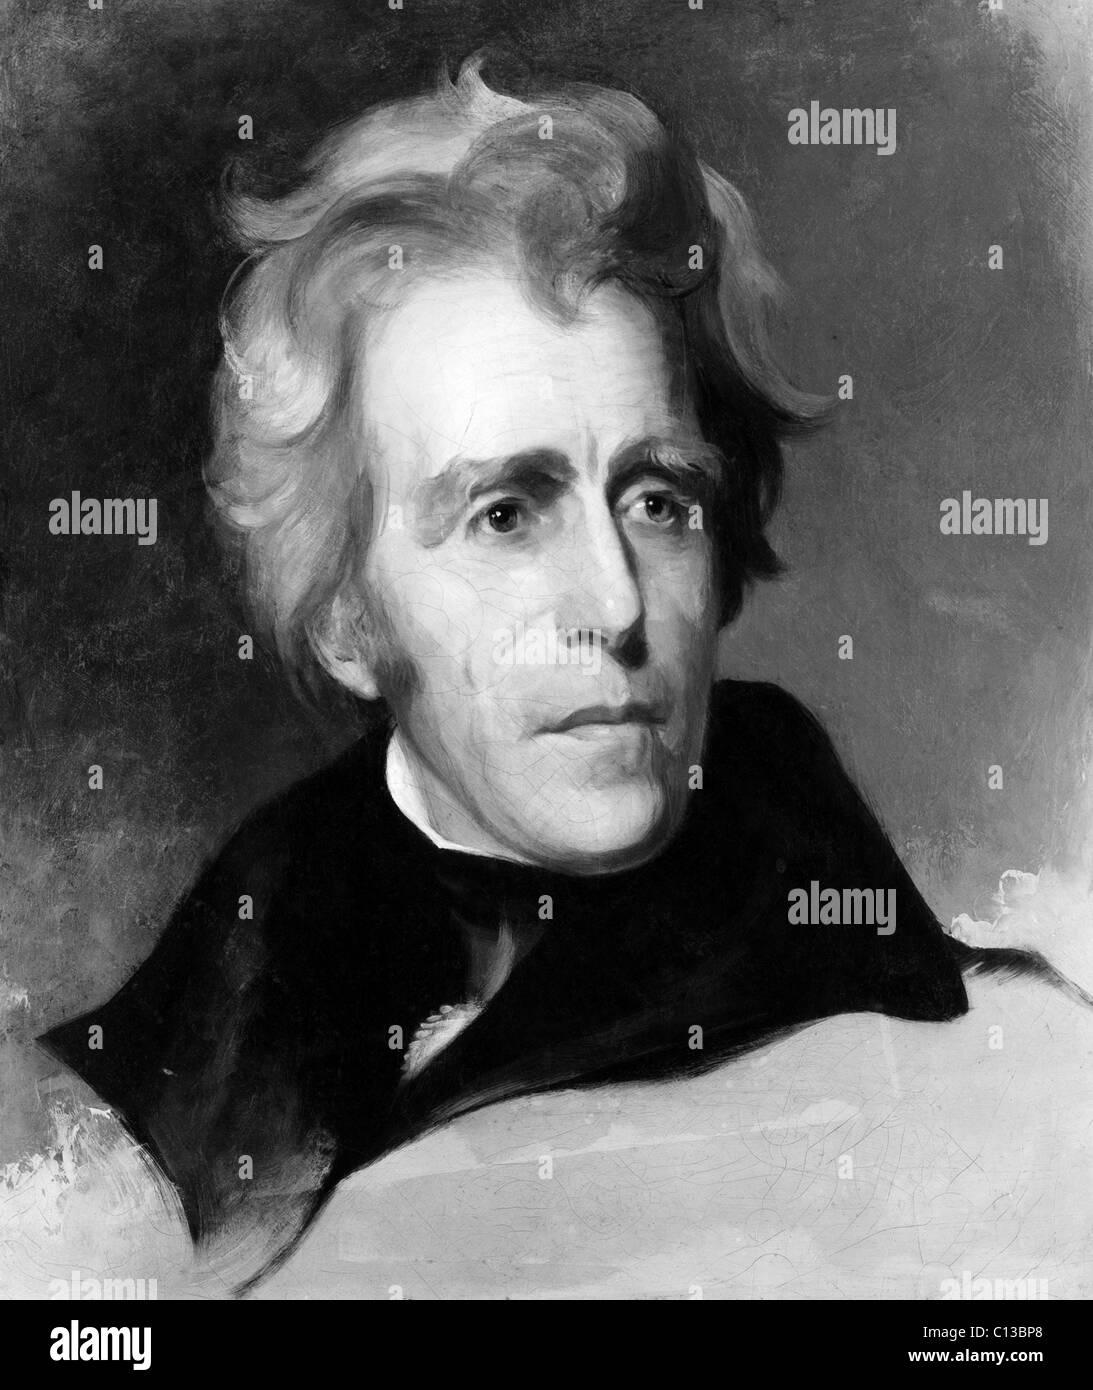 Andrew Jackson (1767-1845), U.S. President 1829-1837, portrait by Thomas Sully, circa 1830s. - Stock Image